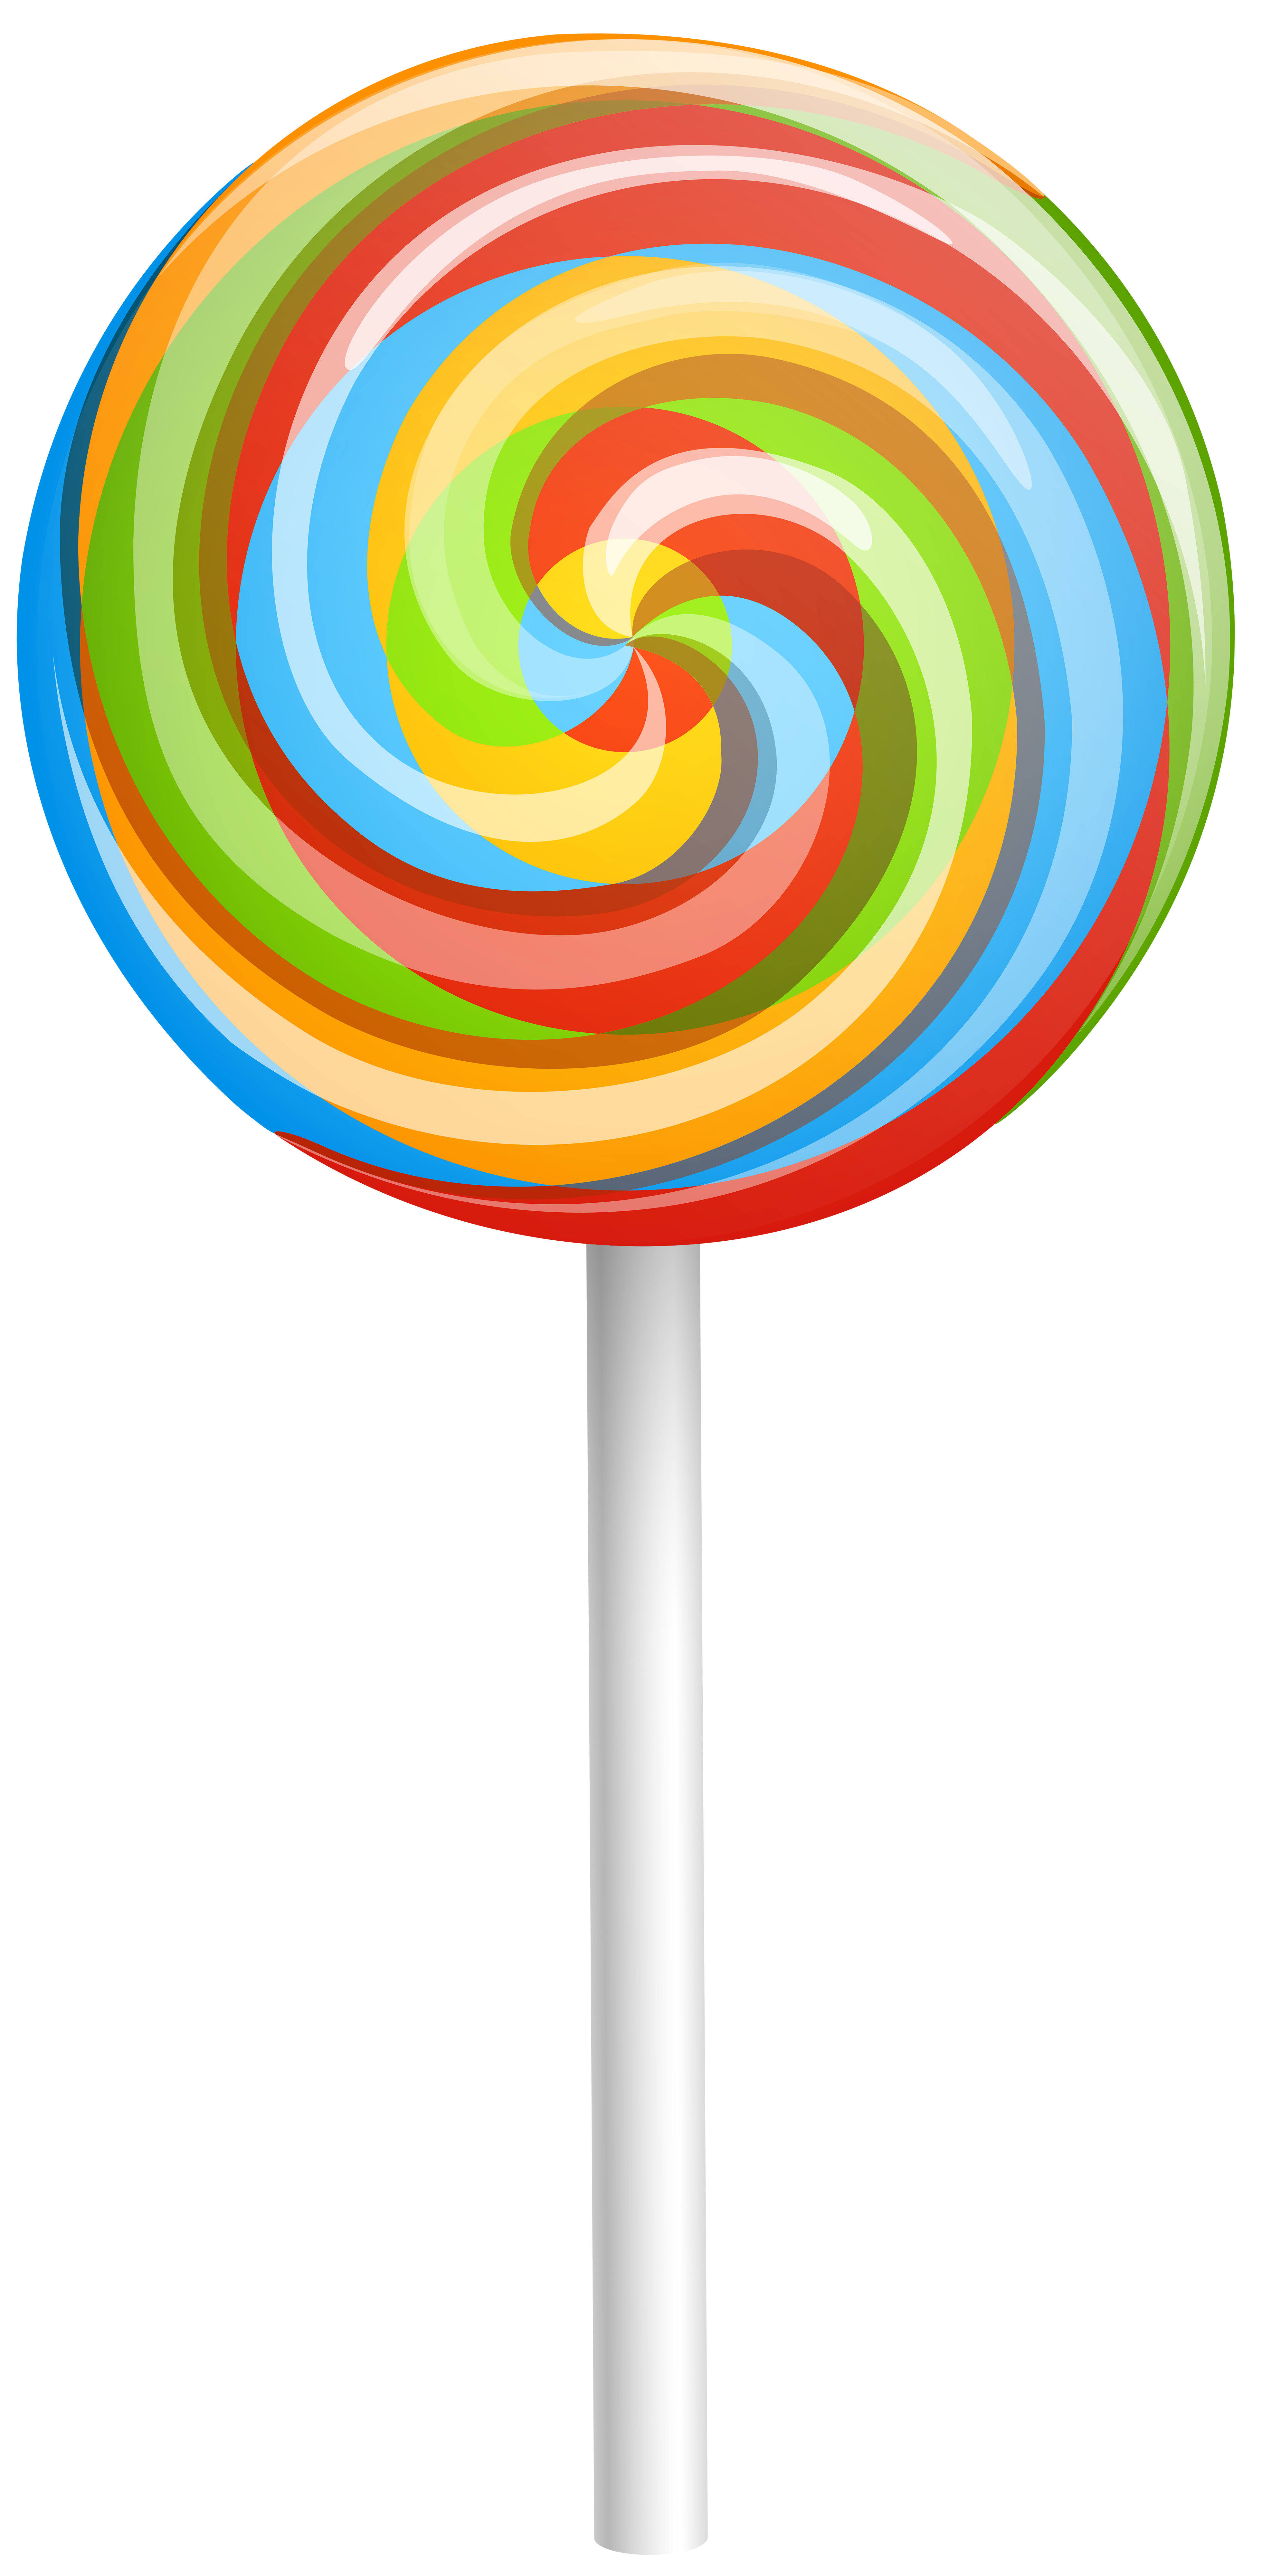 3919x8000 Rainbow Swirl Lollipop Clip Art Image